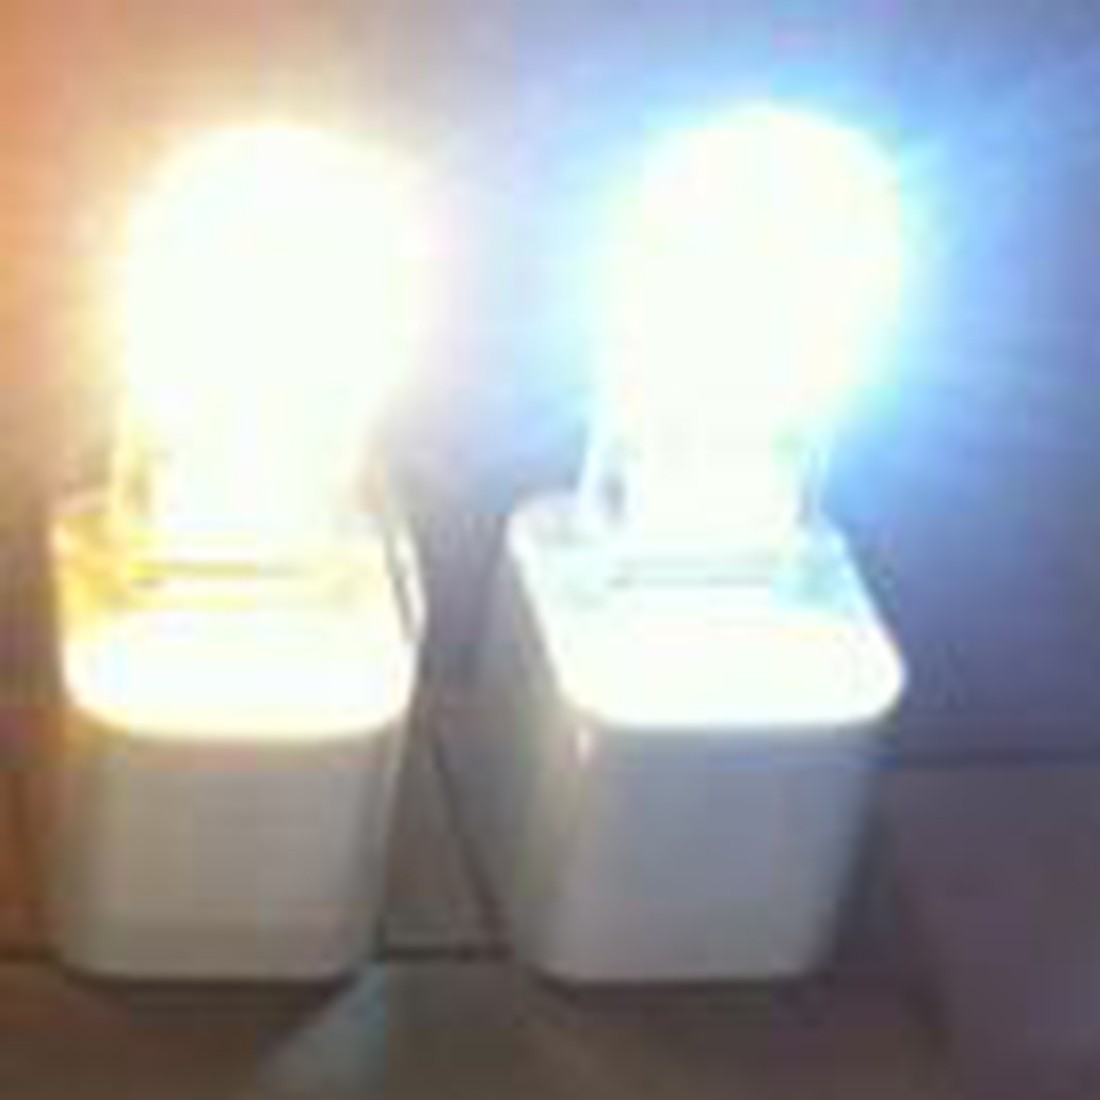 Mini USB 3LEDs Night Light 5V Bulb Cold/Warm Light Lamp for Reading Gadget Notebook Power Bank Computer Laptop mini usb 3leds night light 5v bulb cold warm light lamp for reading gadget notebook power bank computer laptop